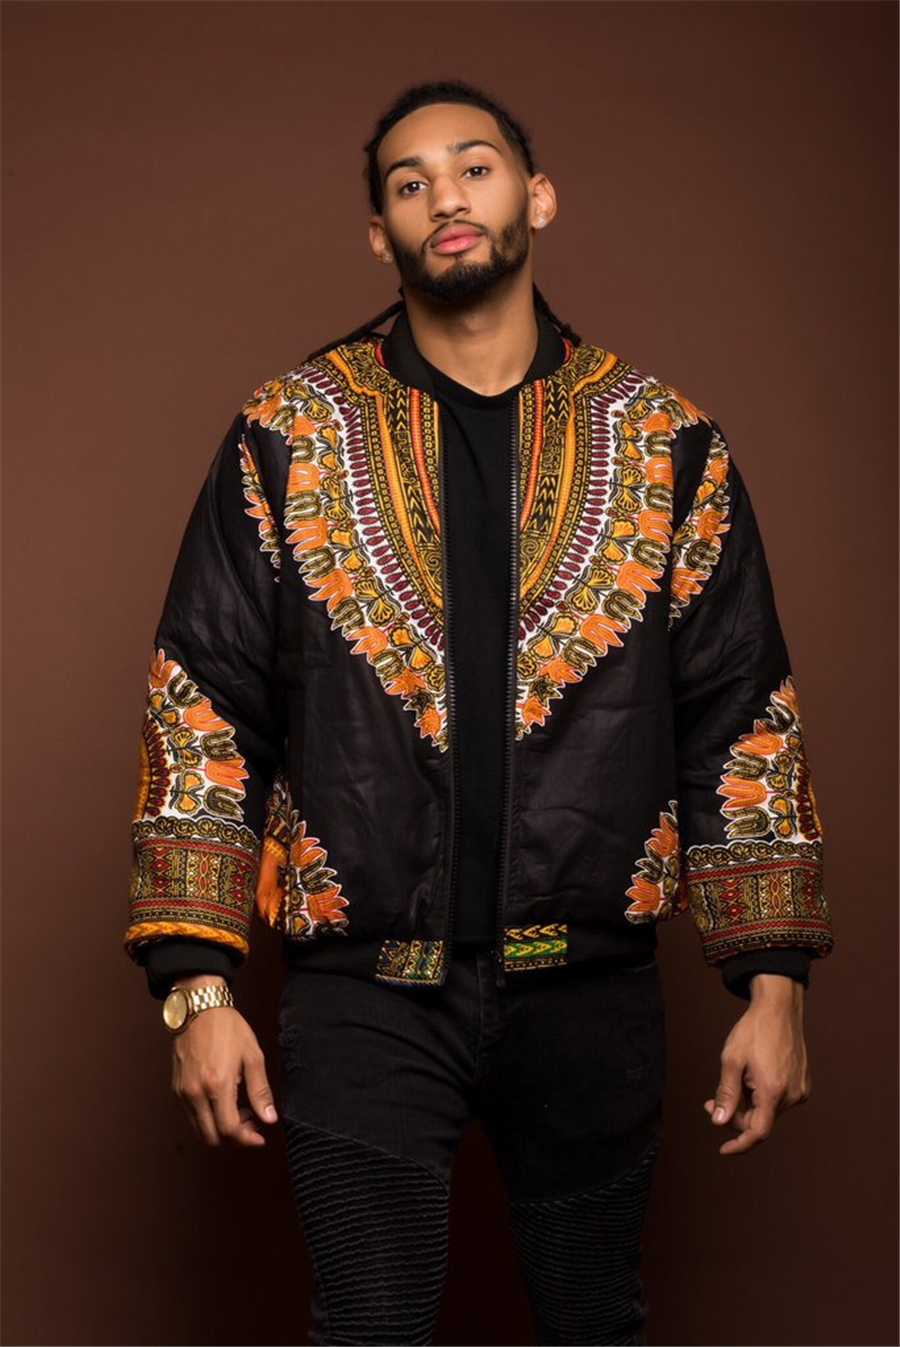 GuyuEra Hot Sale Africa Men\`s Dashiki Style Couple Wear Vintage Ethnic Men\`s Dashiki Jacket African Print Jacket Plus size S-XL (18)